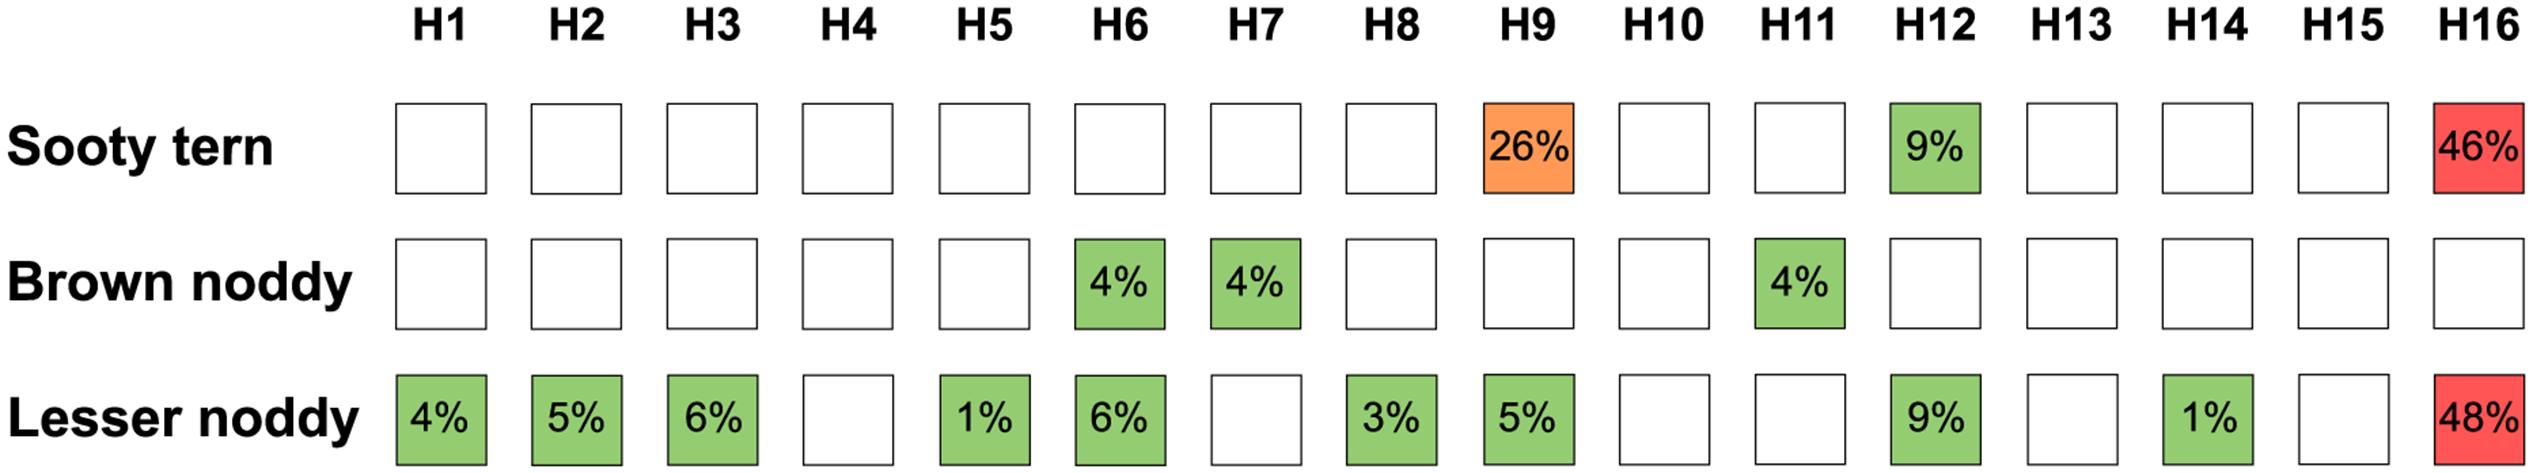 Hemagglutinin (HA)-specific antibody diversity in species in the Charadriiformes order.